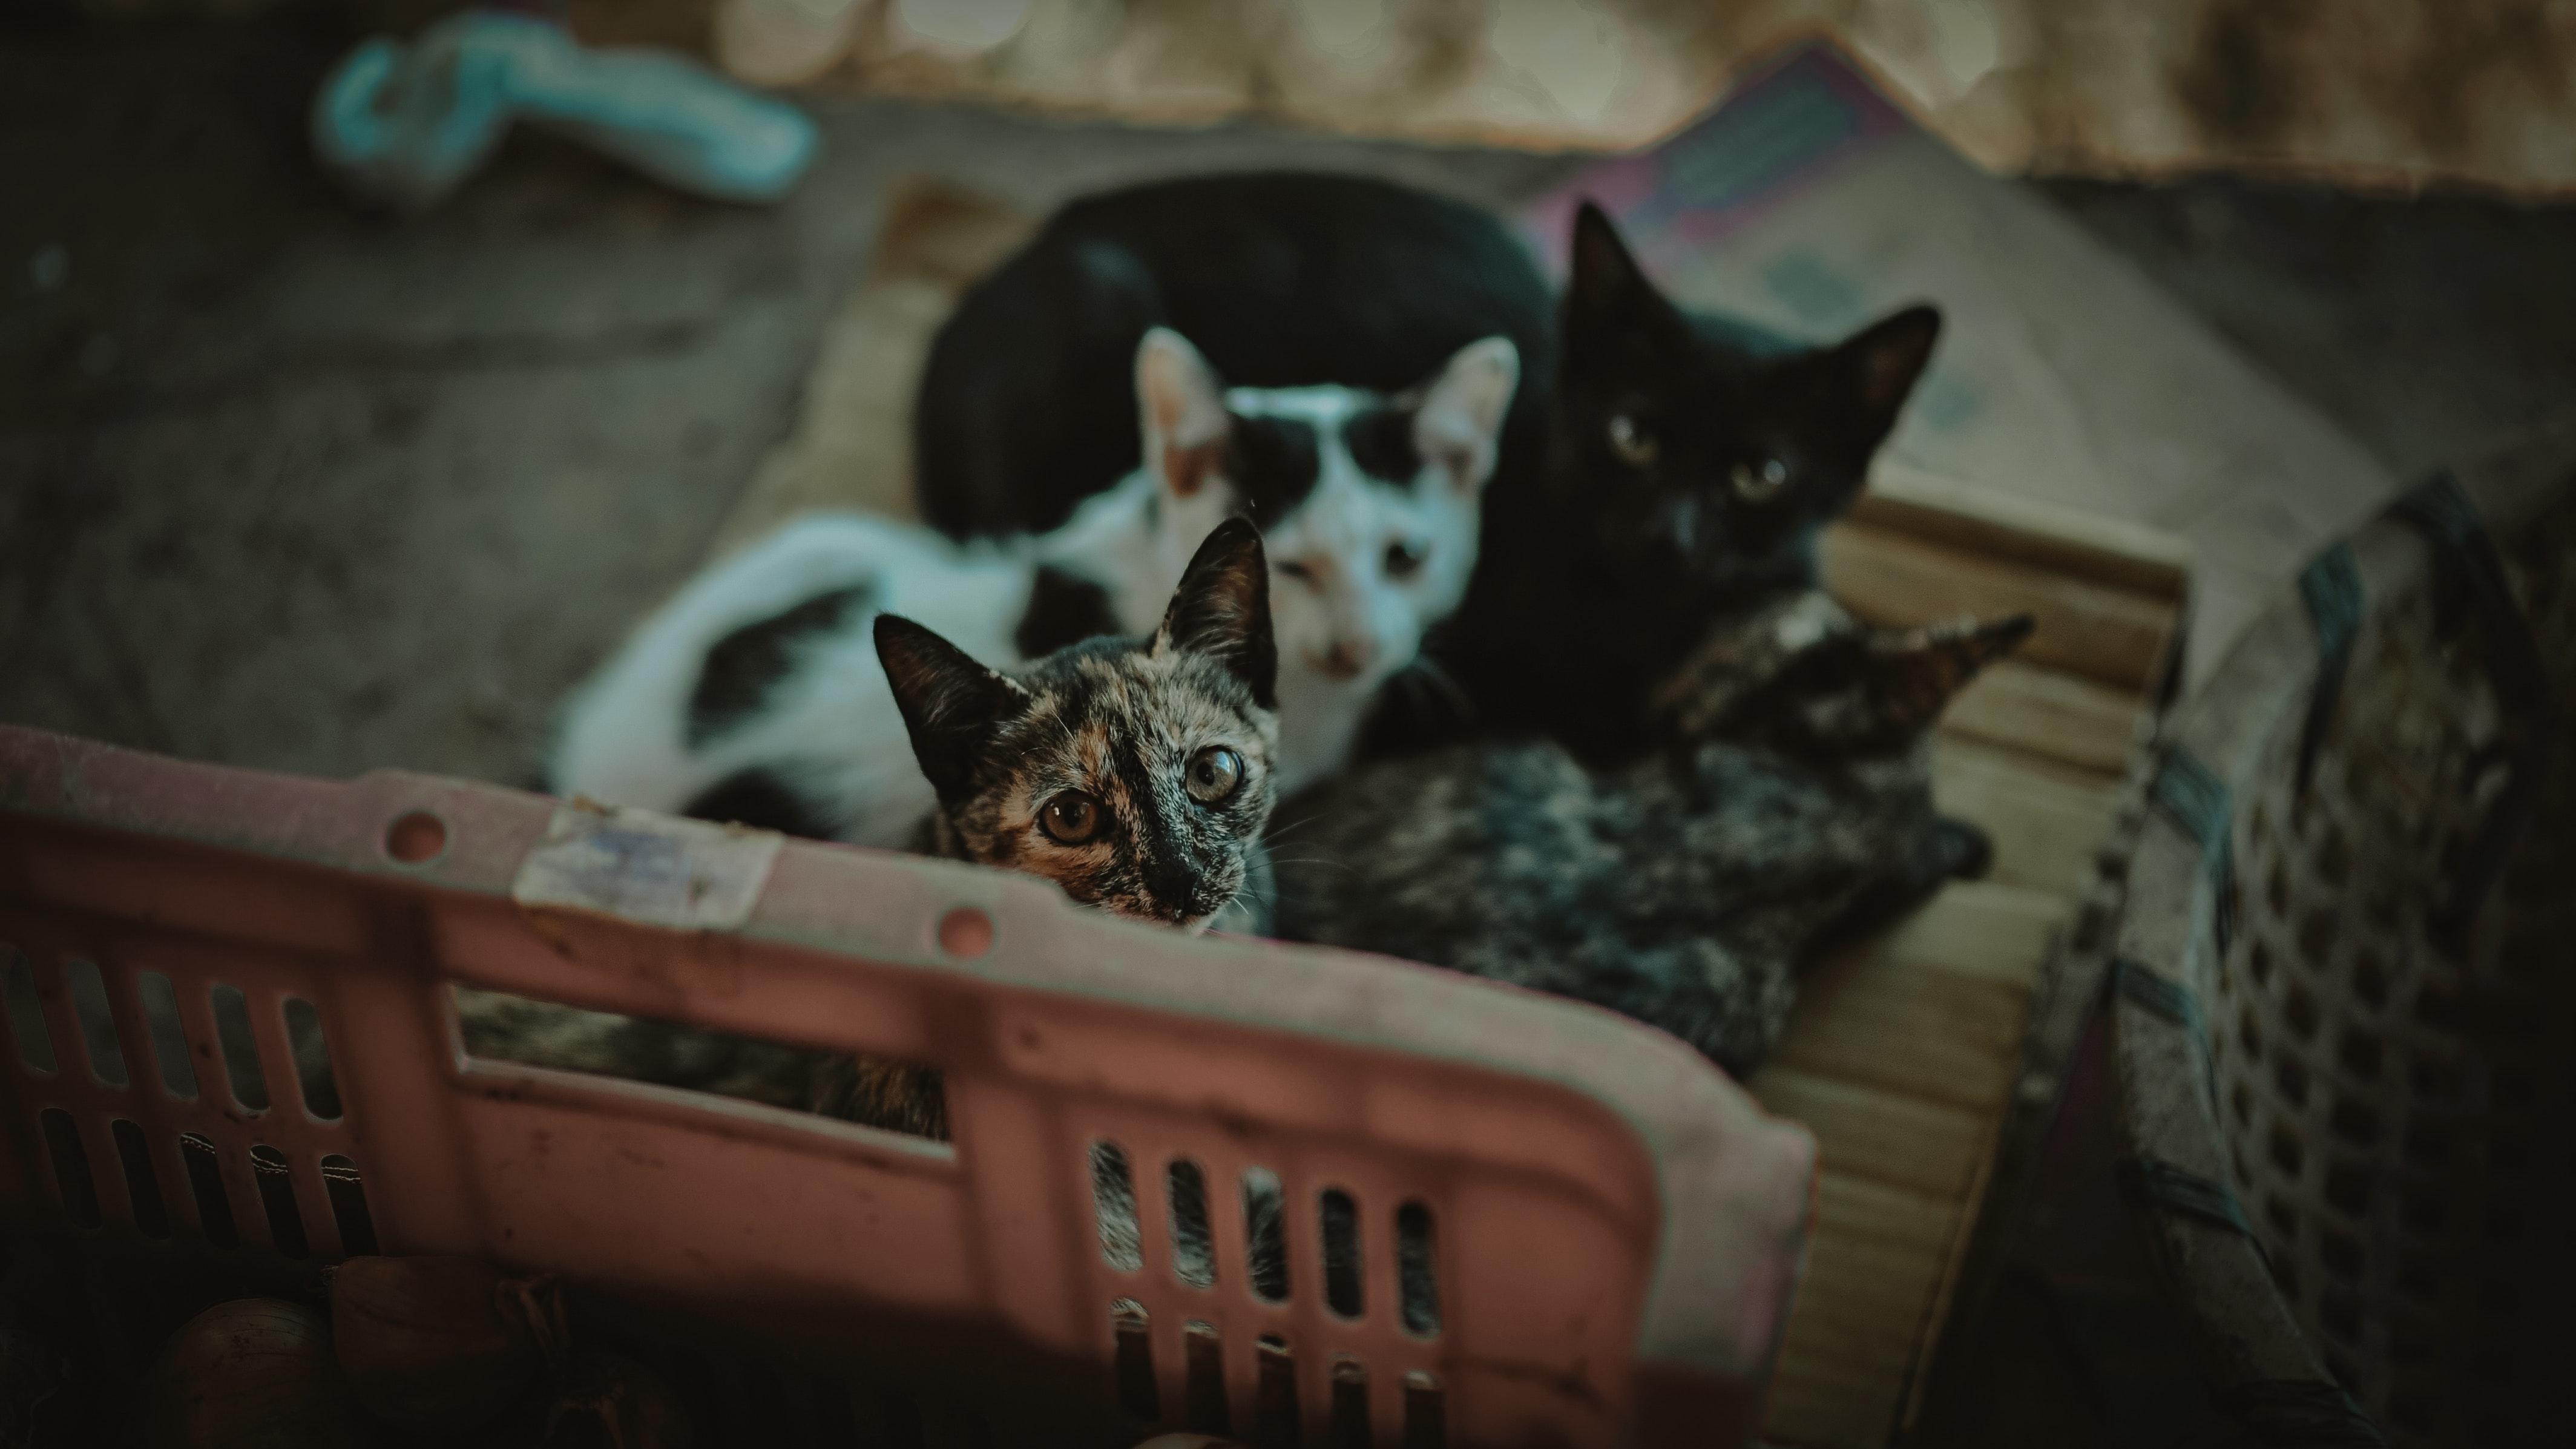 Four kittens photo